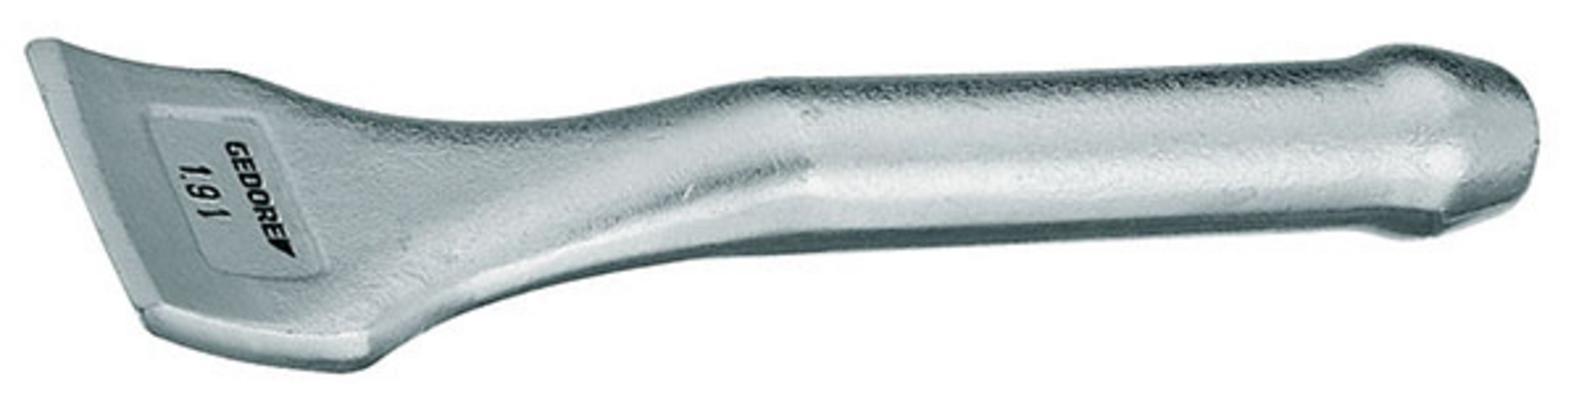 Rengasrauta (300 mm), Gedore - Rengasrauta (300 mm), Gedore